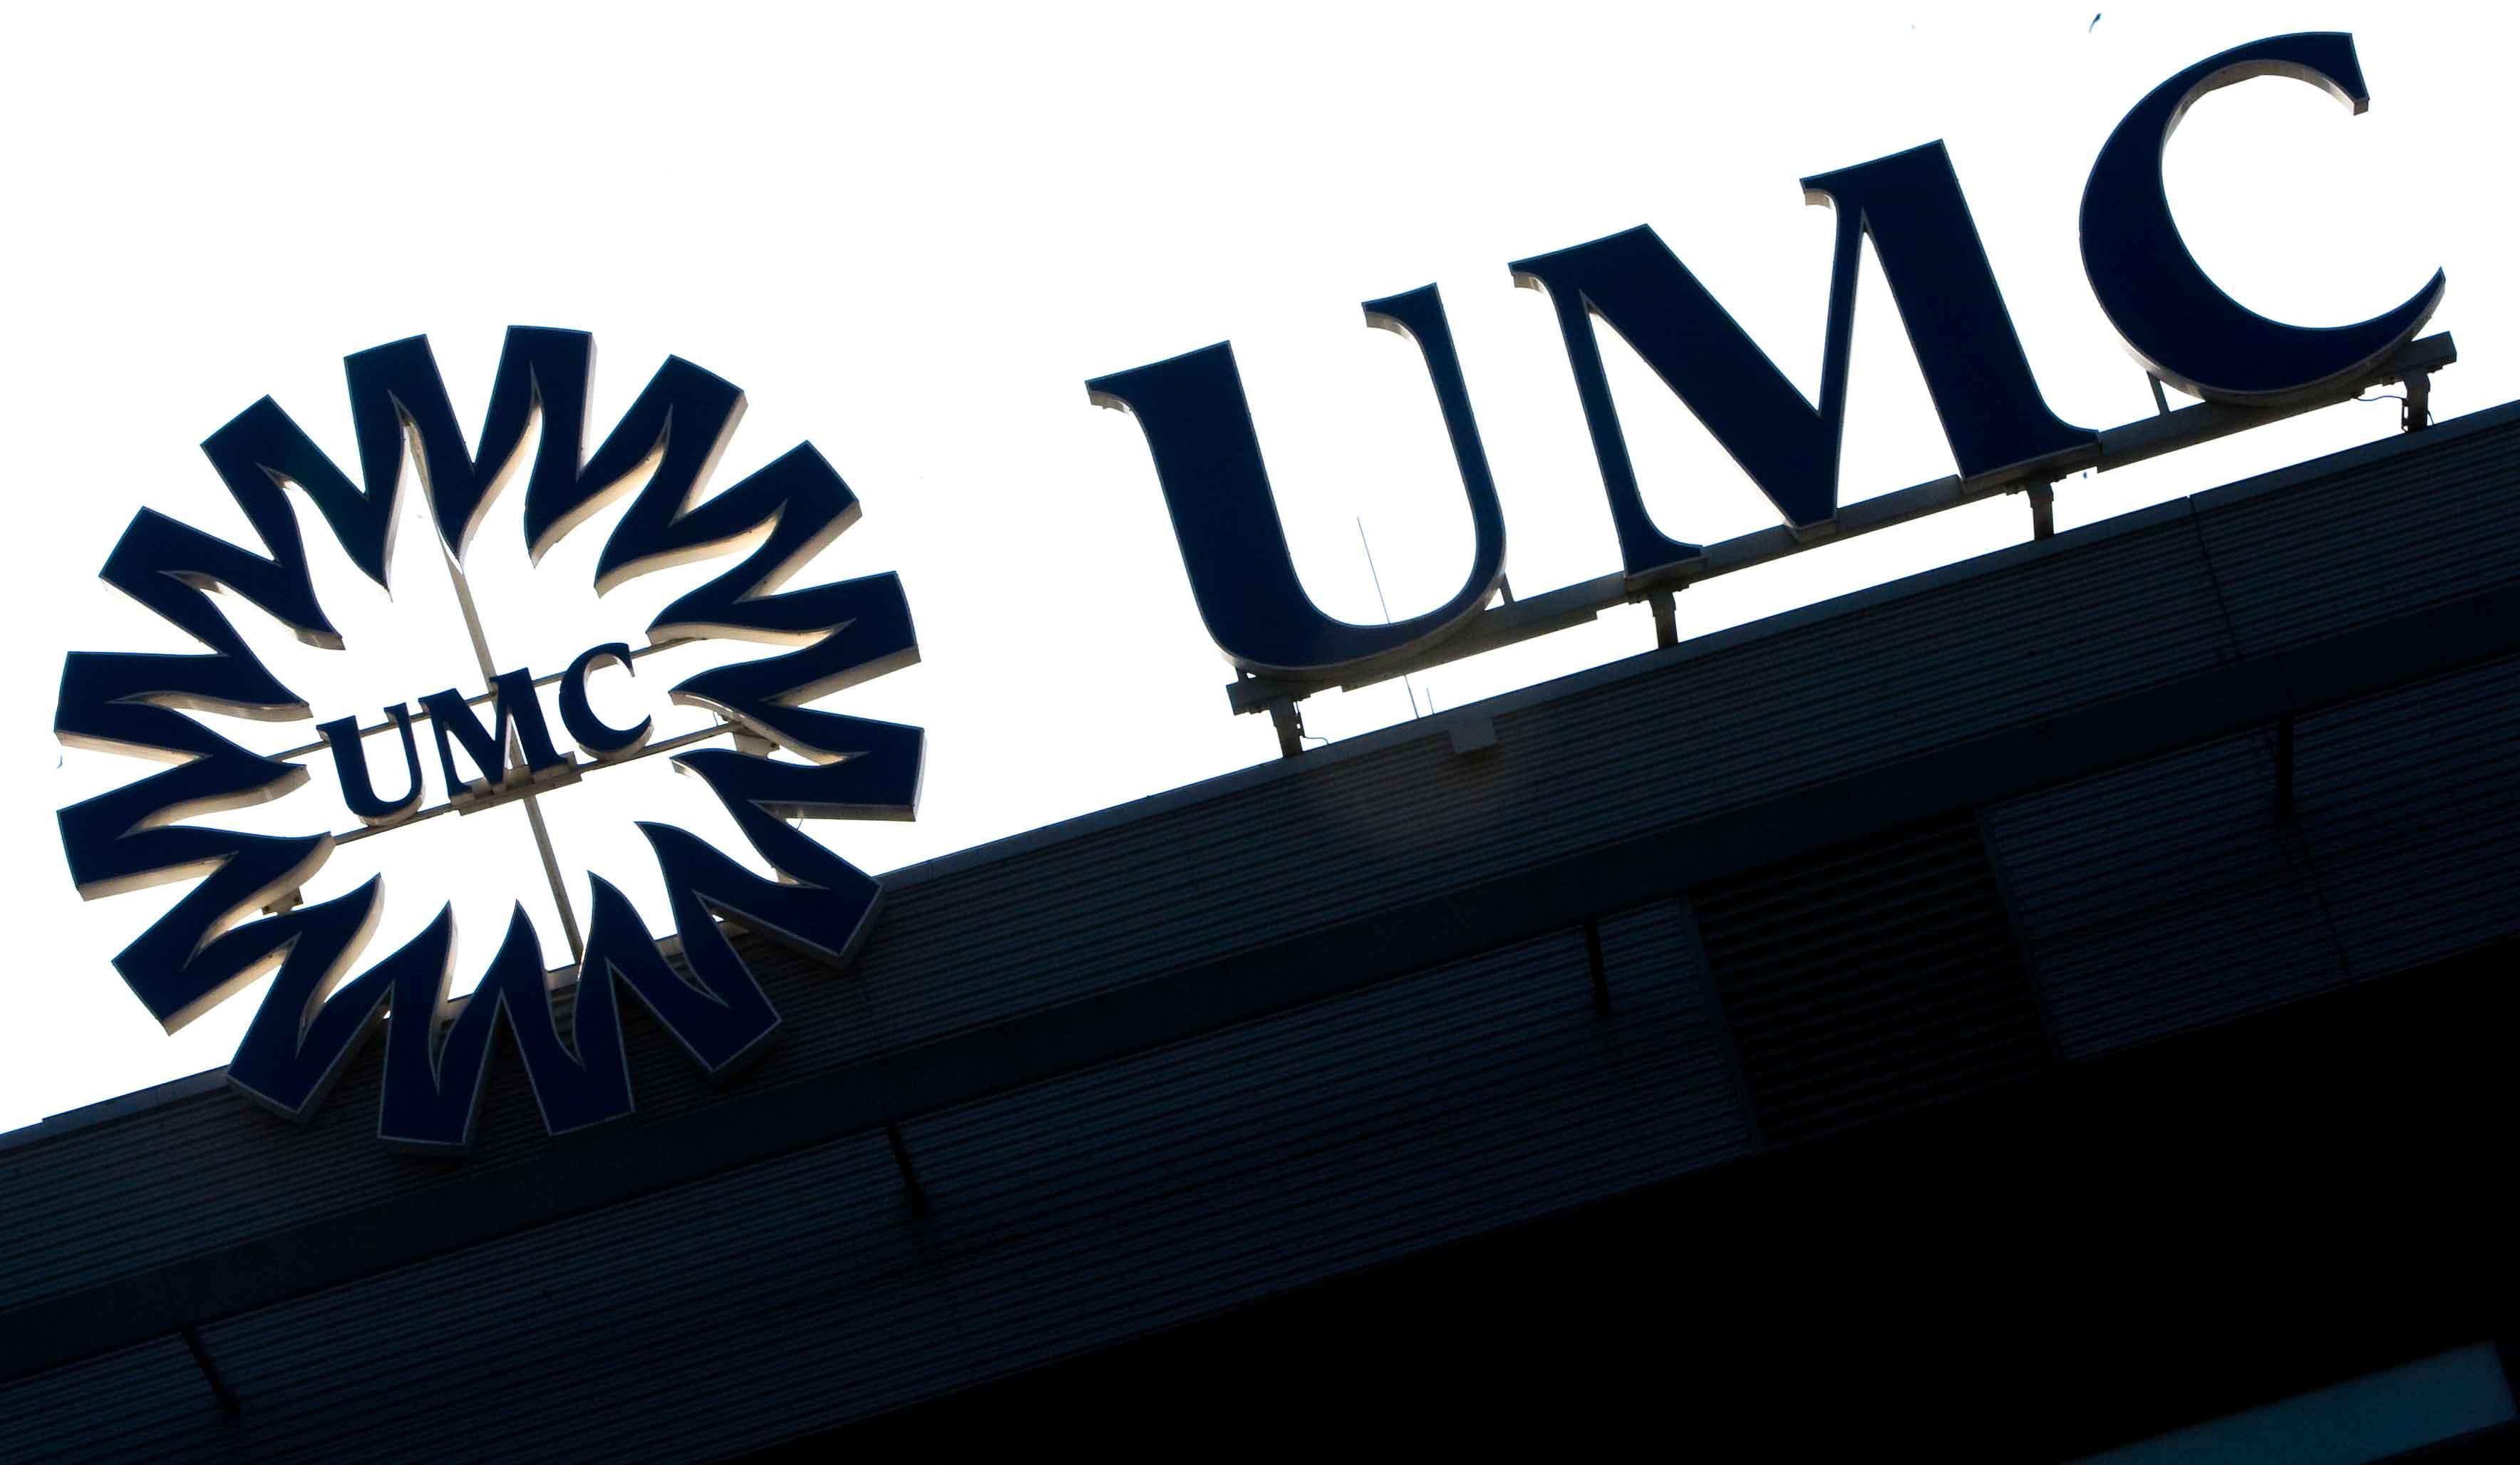 Logo_UMC-Universitair-Medisch-Centrum_dian-hasan-branding_Utrecht-NL-13